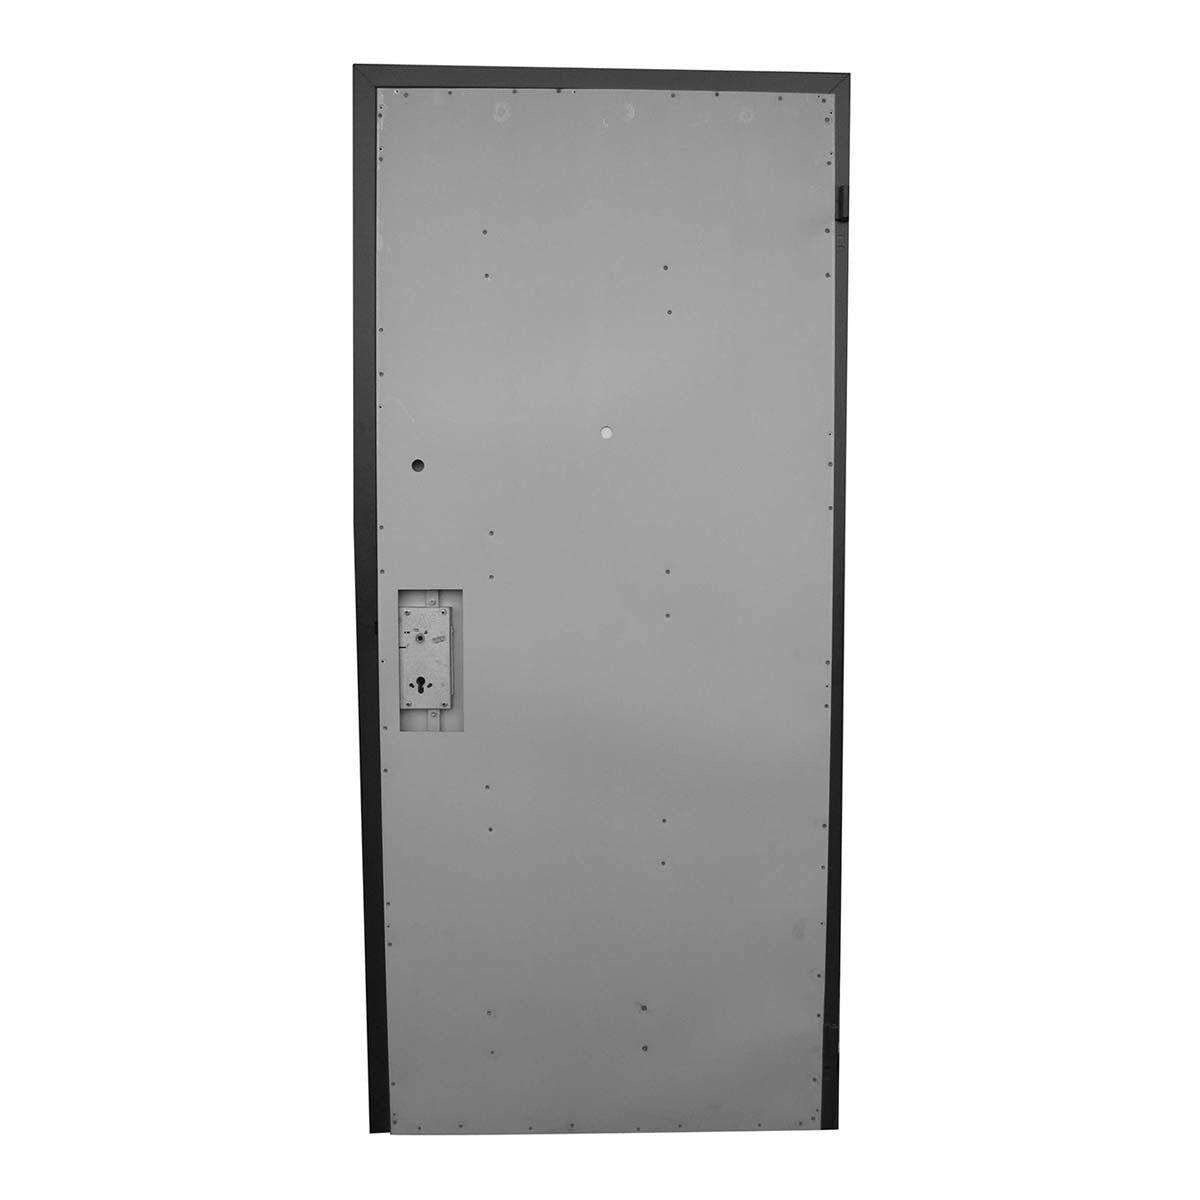 Porta Blindata Naked Doppio Cilindro Apertura Spinta A Sinistra 210x90 Cm (Hxl) Classe 3